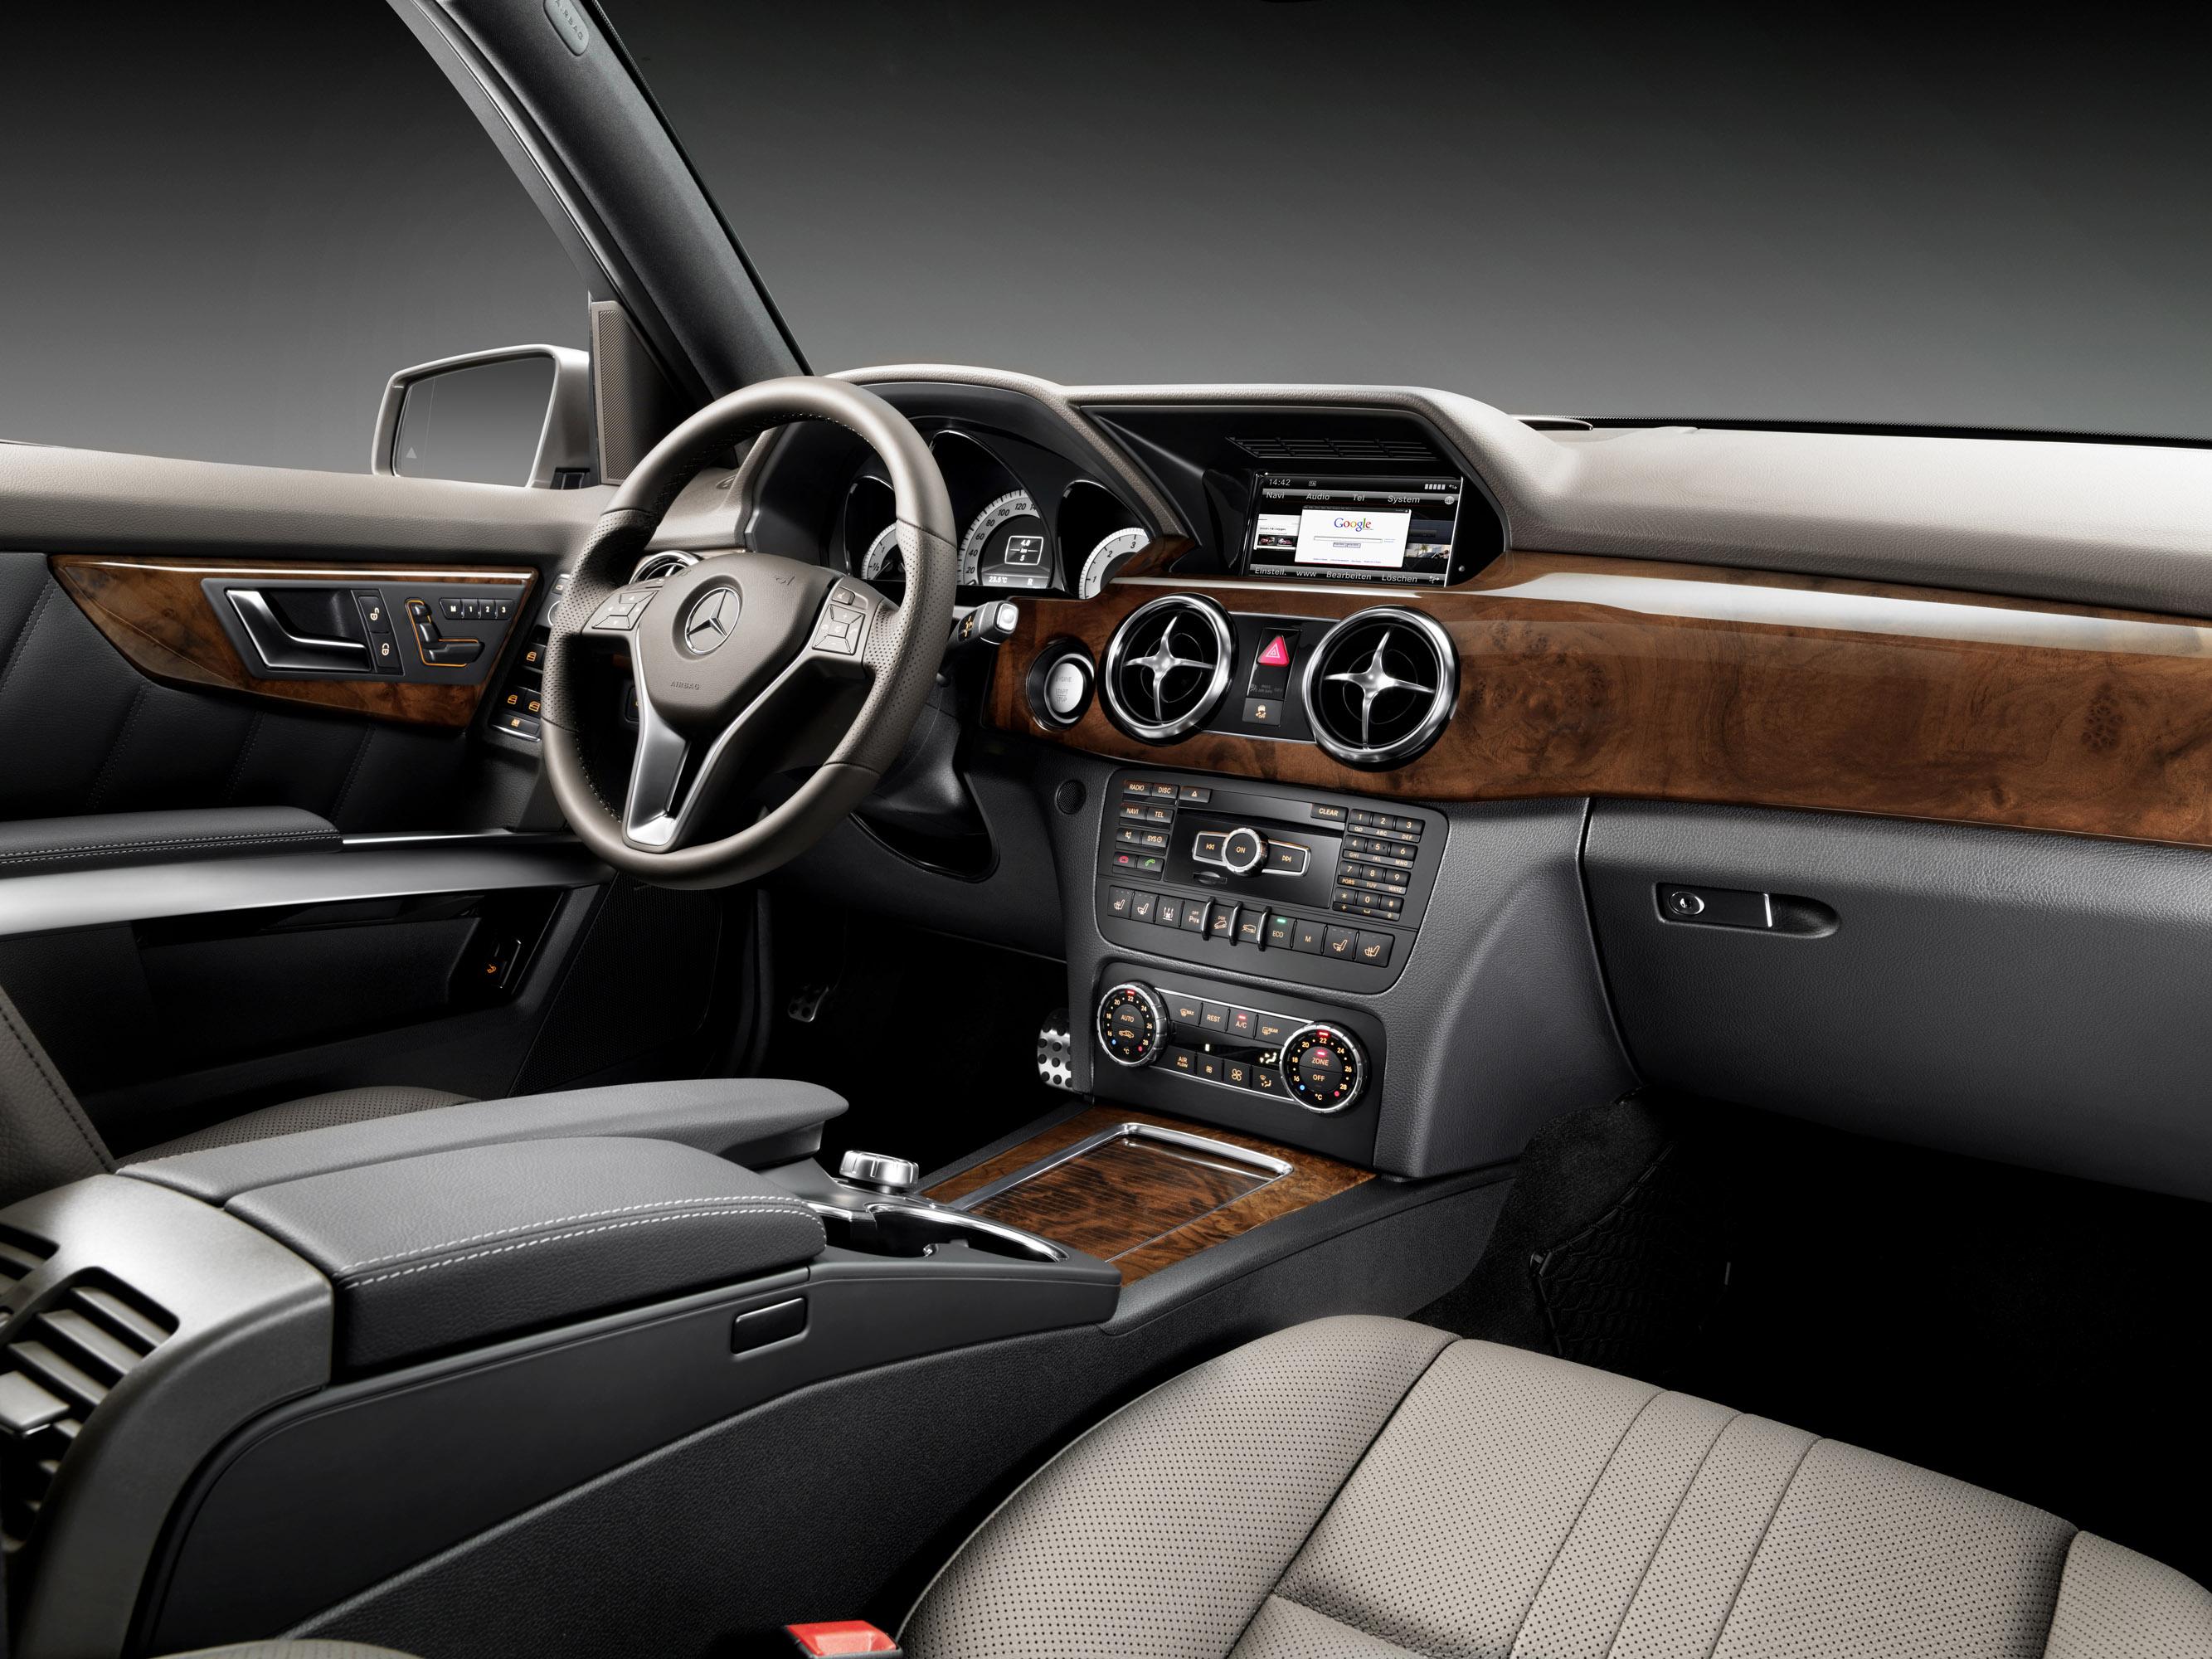 2012 Mercedes-Benz GLK - Picture 66976